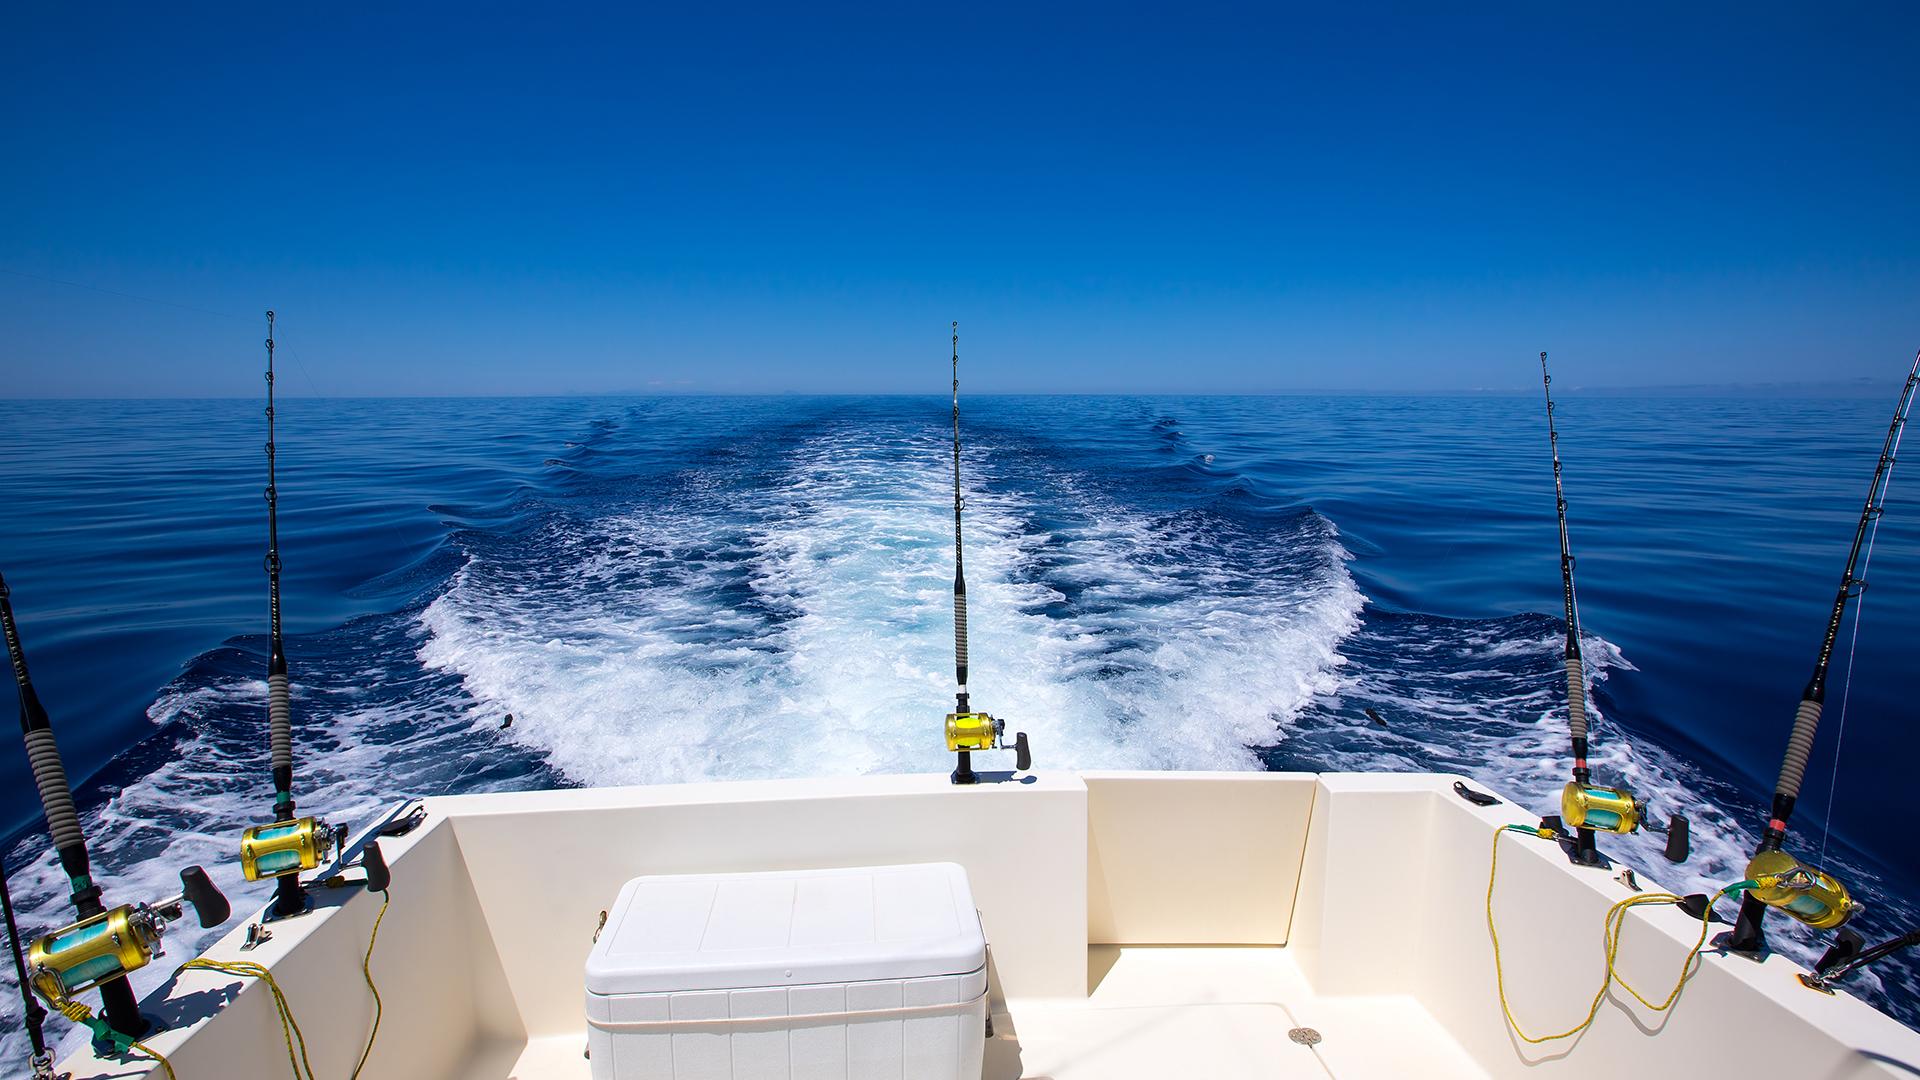 Boat Rear